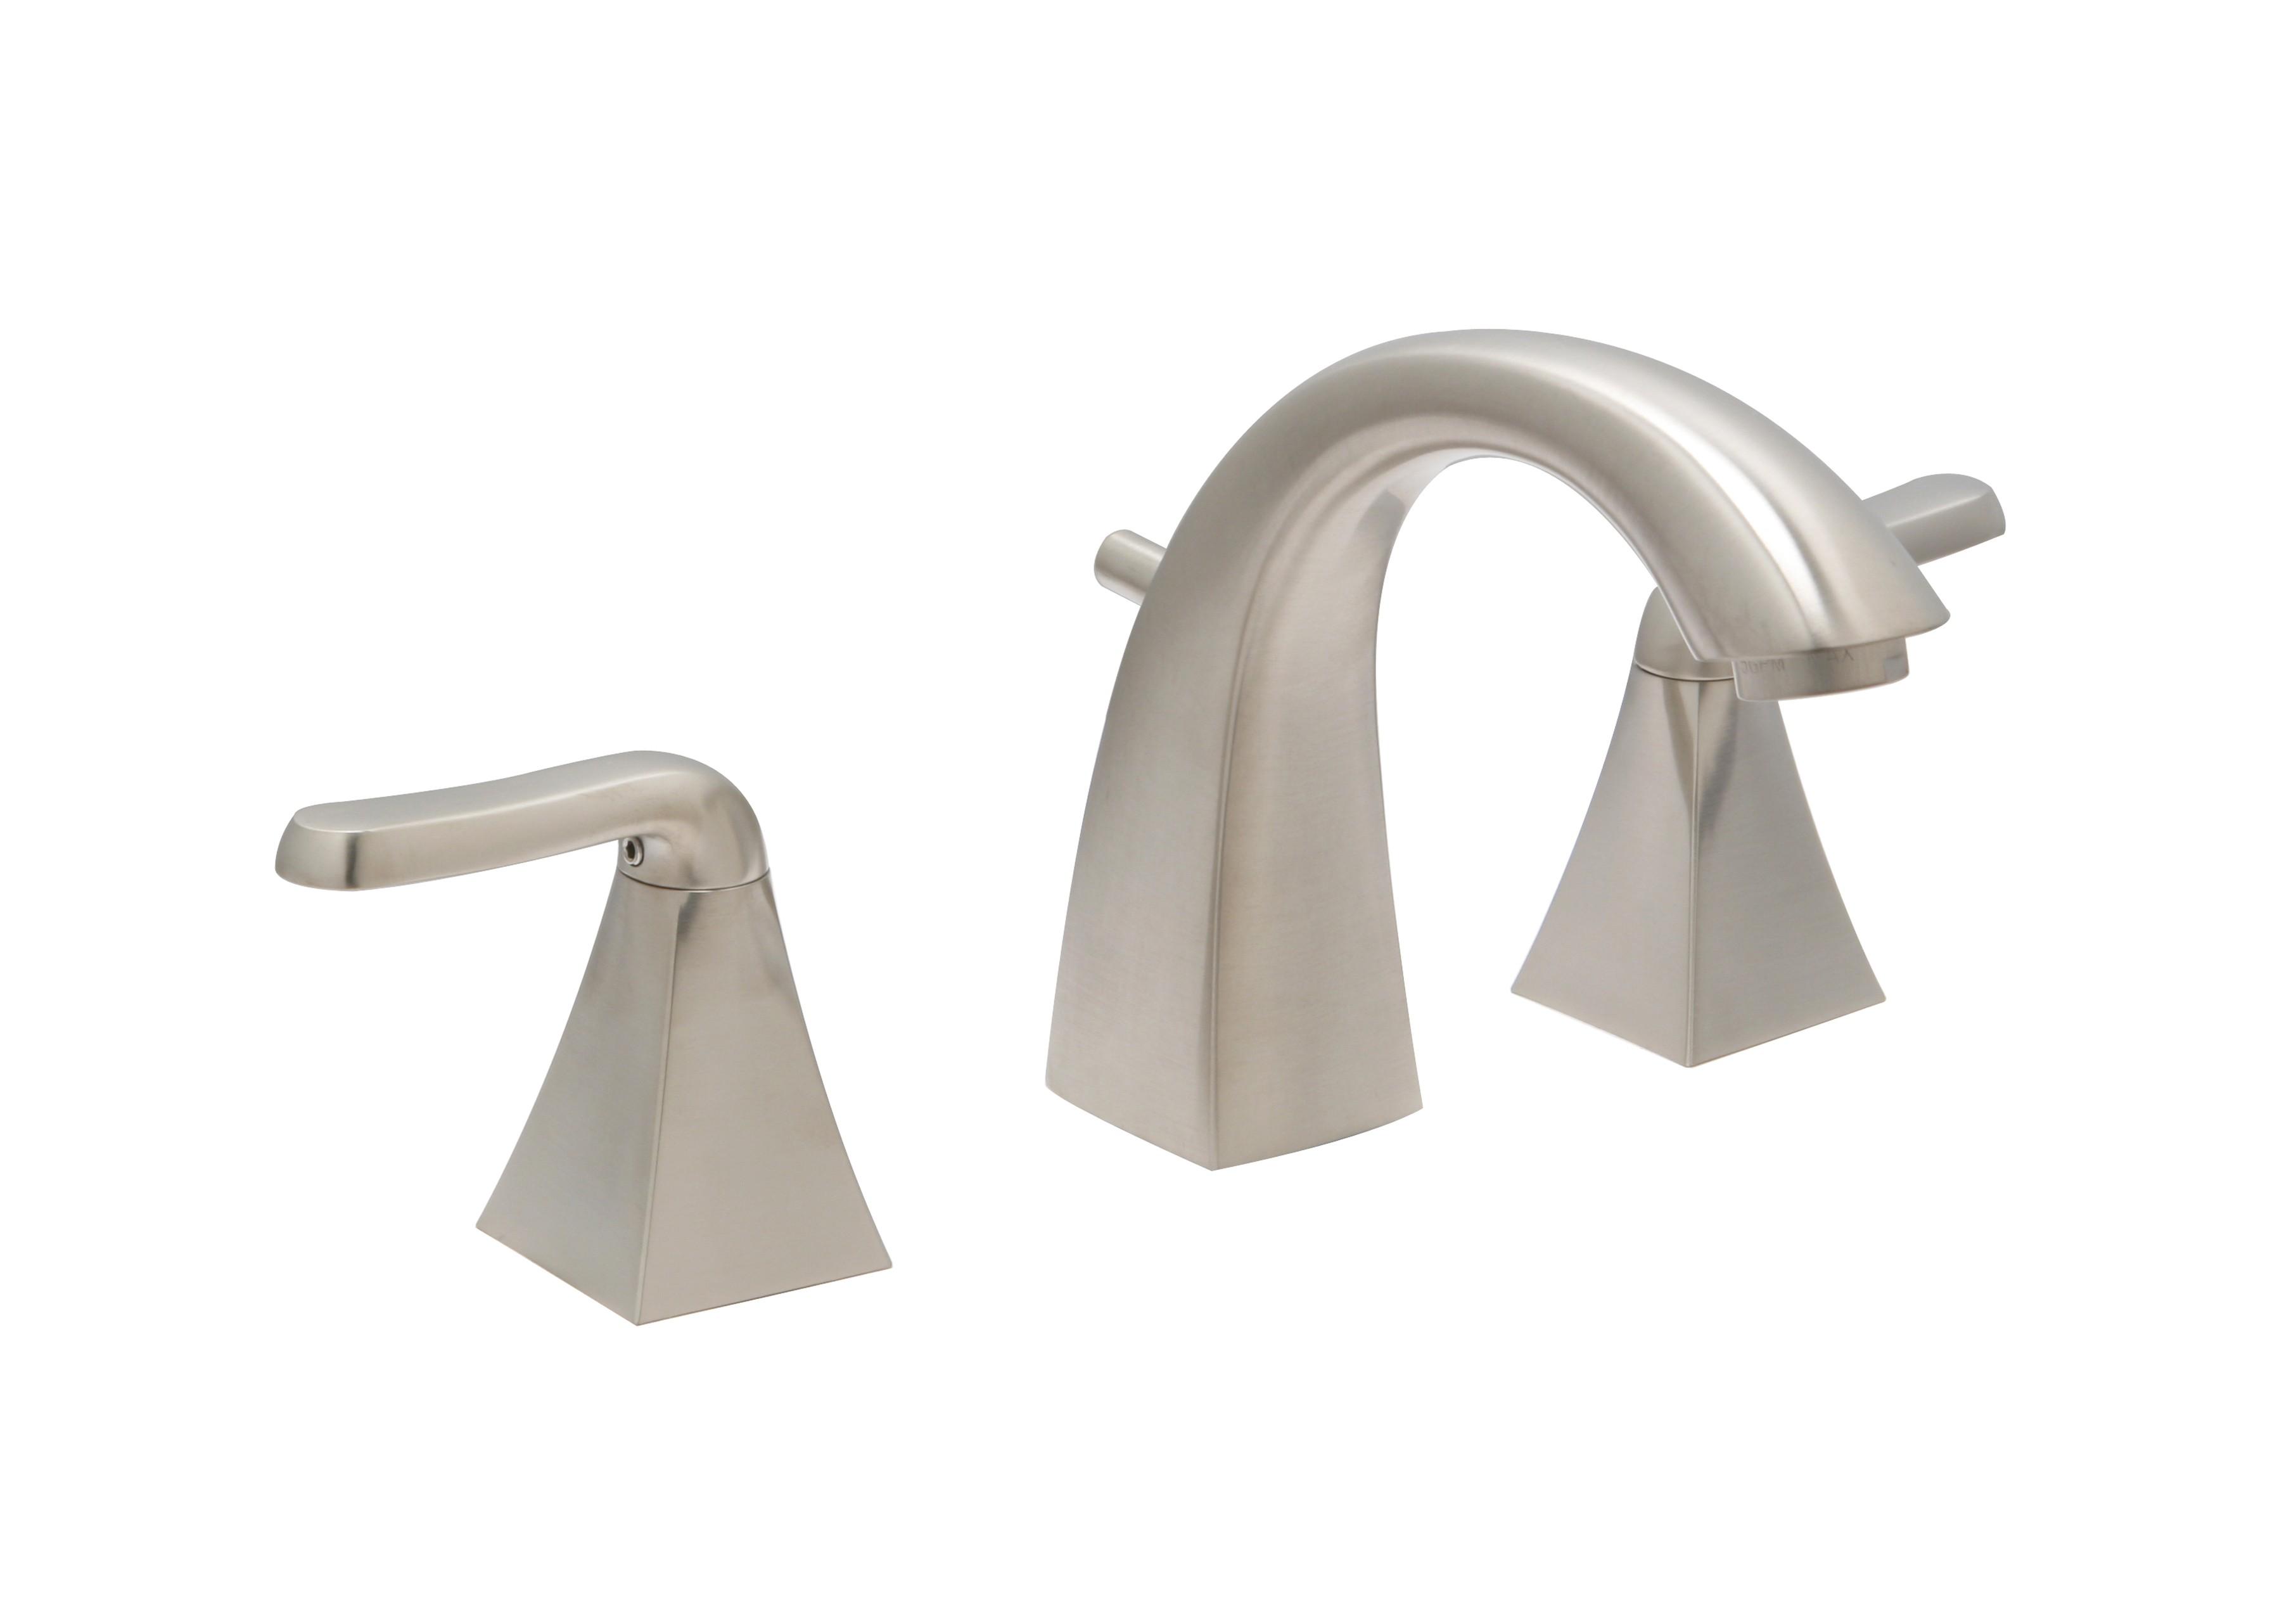 Merced Widespread Faucet W4520202-1